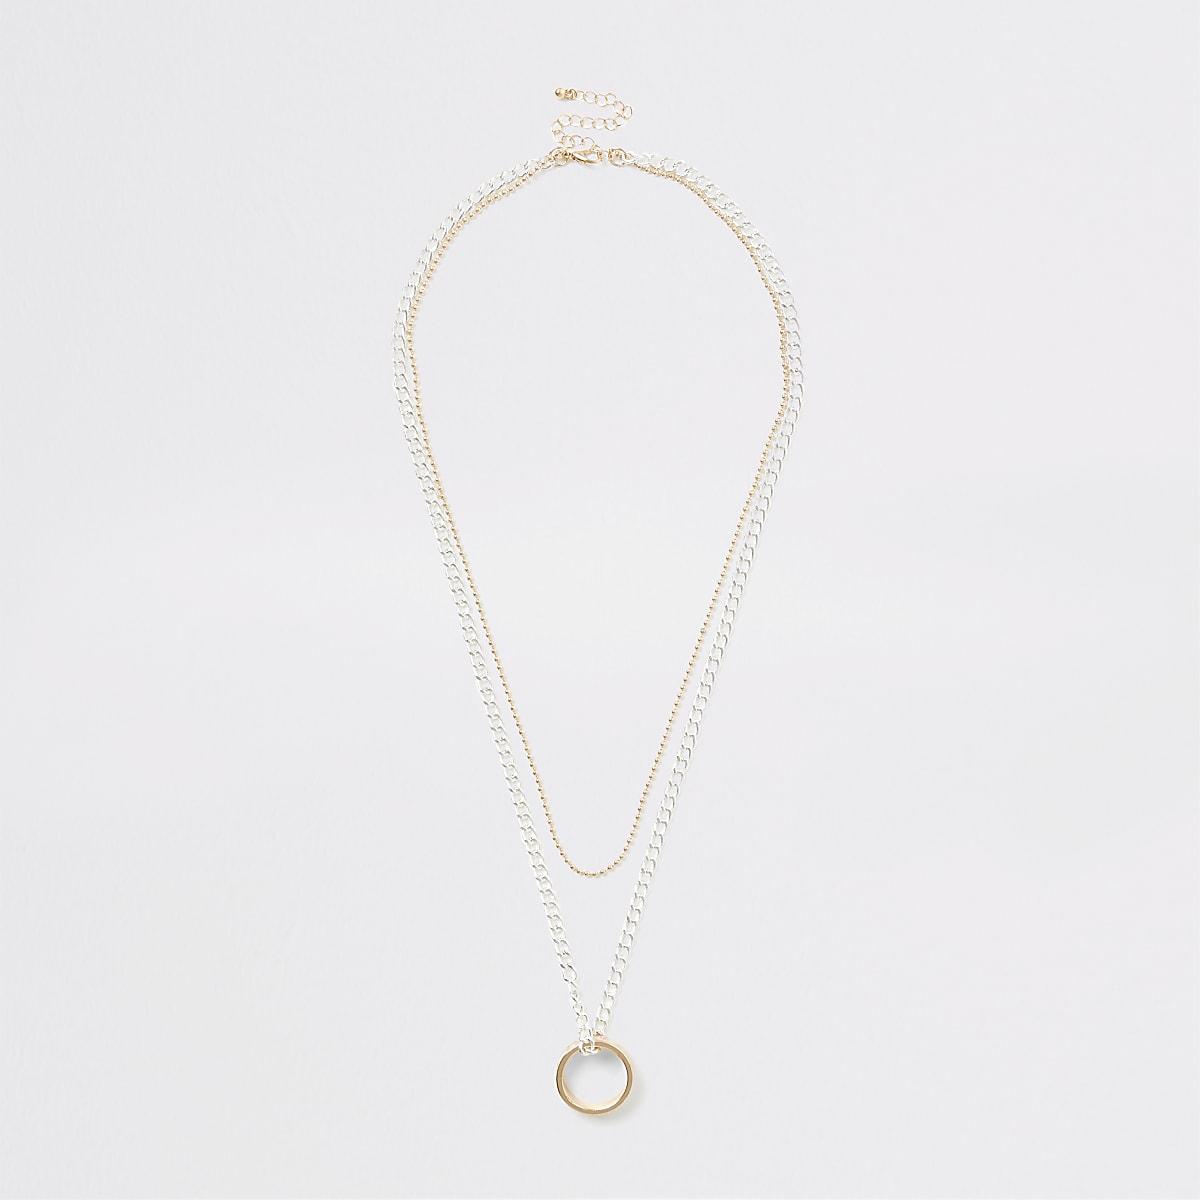 Goud- en zilverkleurige gelaagde ketting met ring